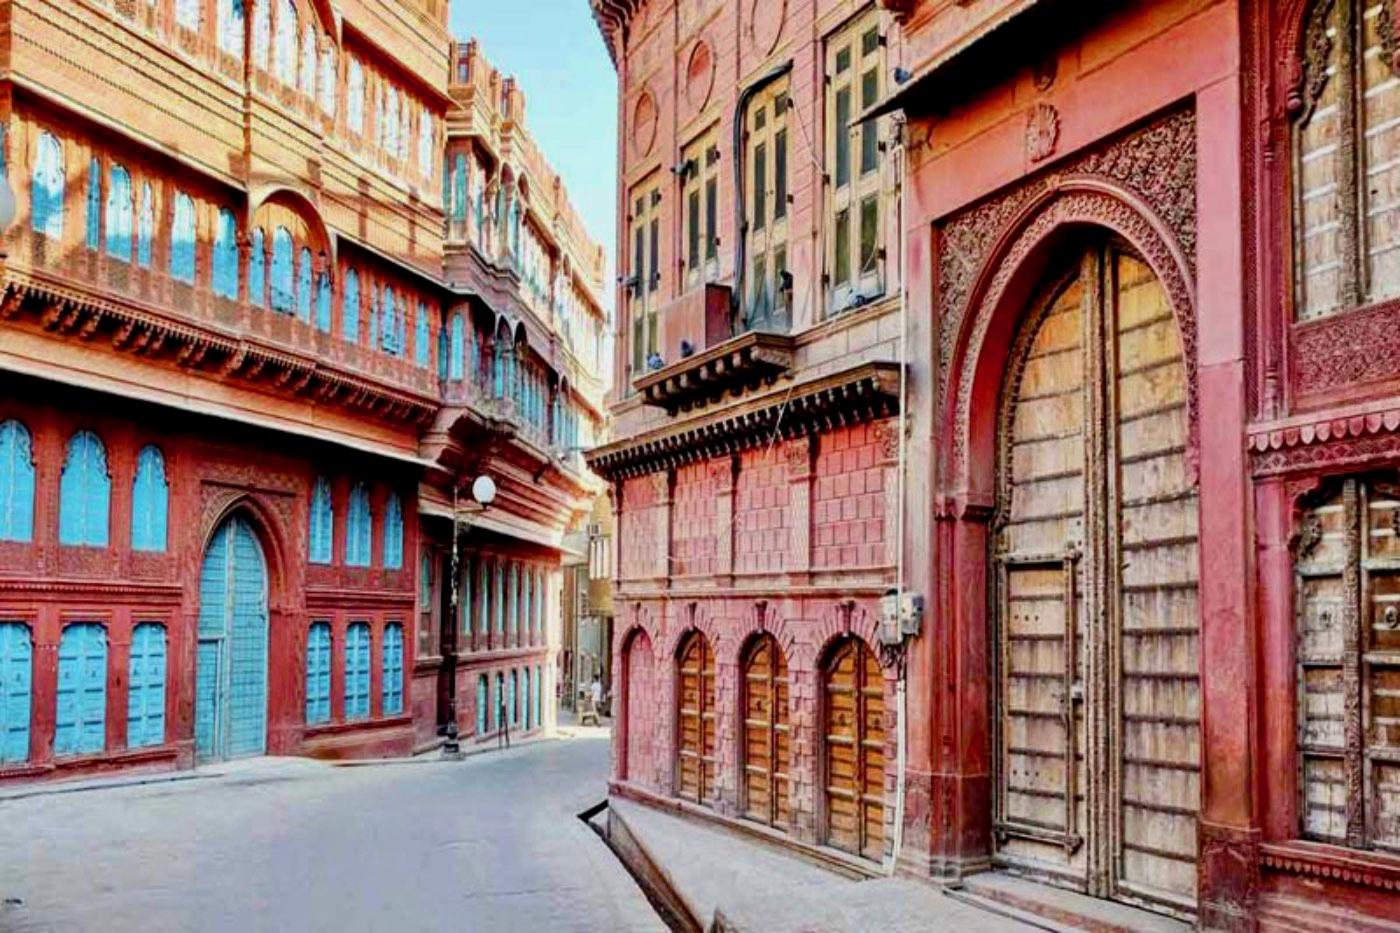 Streets of Bikaner Rajasthan India